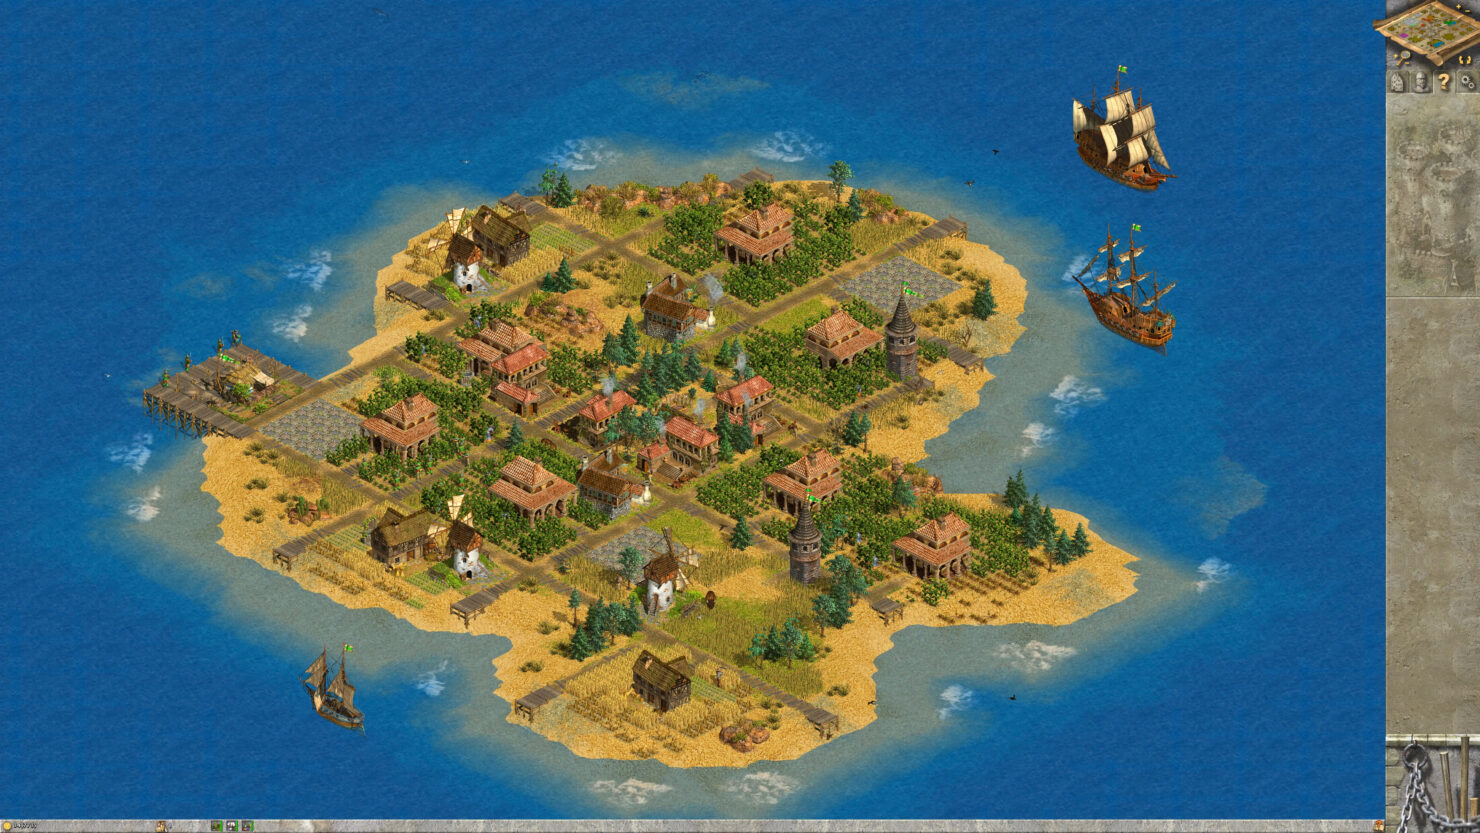 2534345ec8208c796835-09715864-anno1503_historycollection_small-island